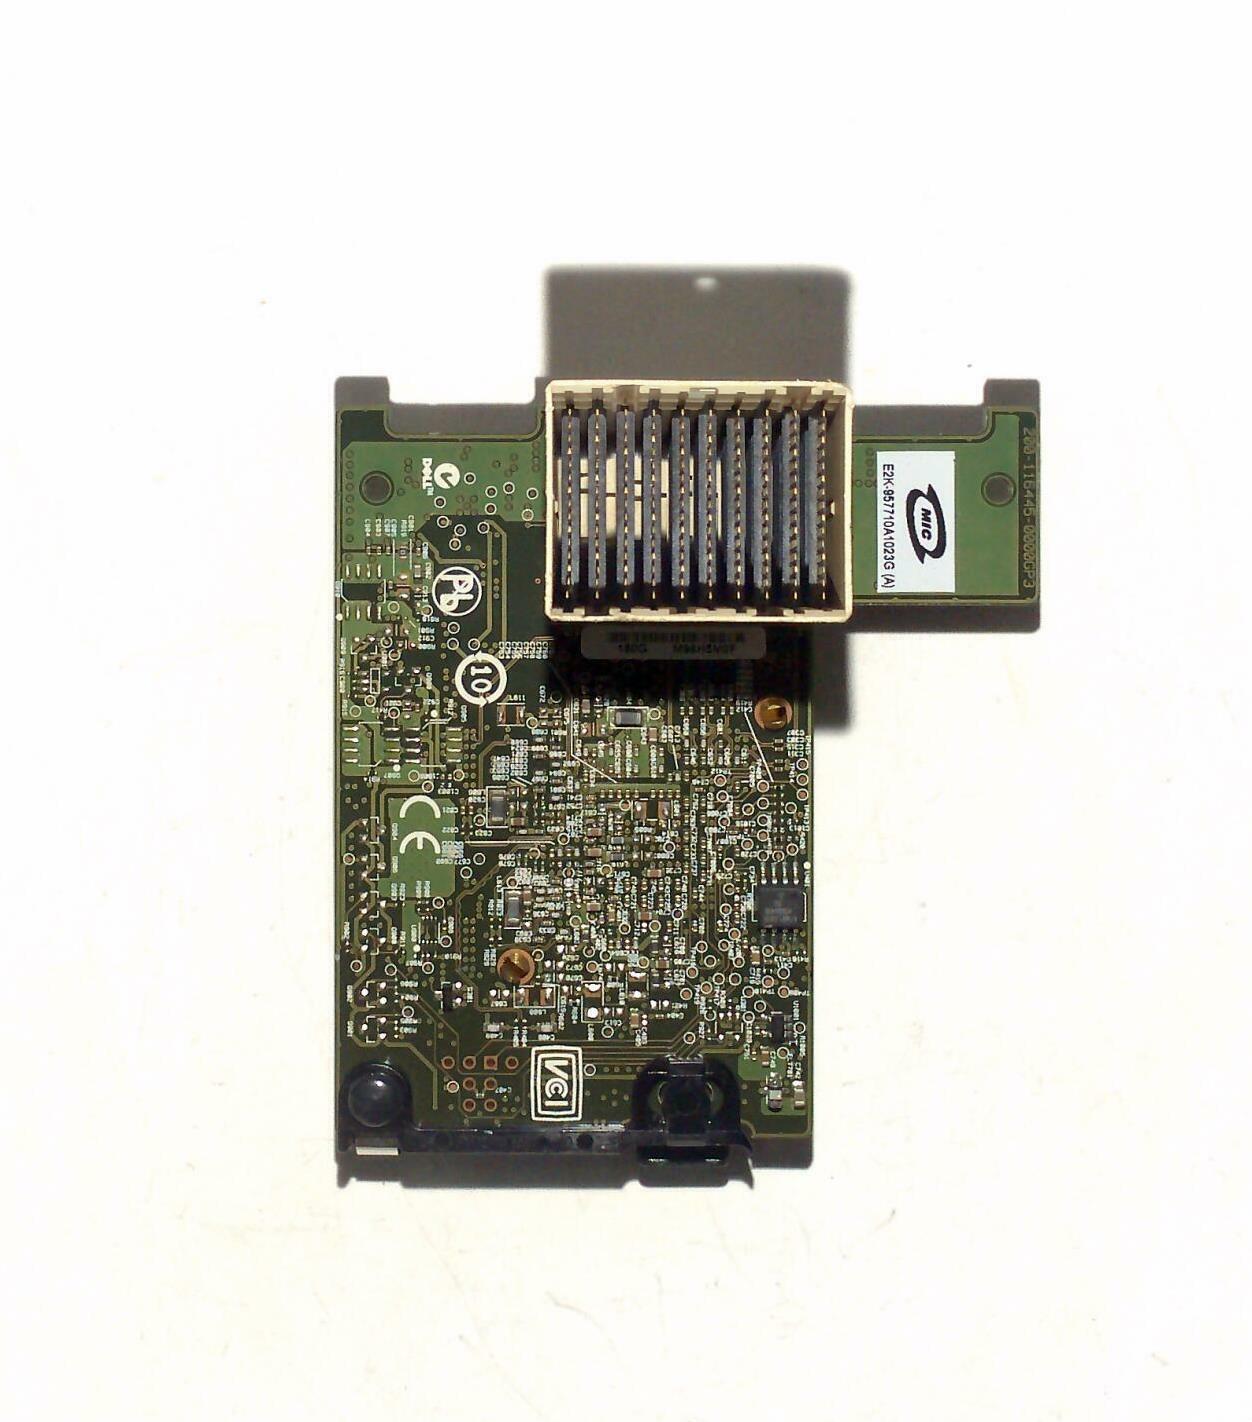 Dell Broadcom nextreme II 57710 10gbe dual port mezzanine card 0w807f w807f